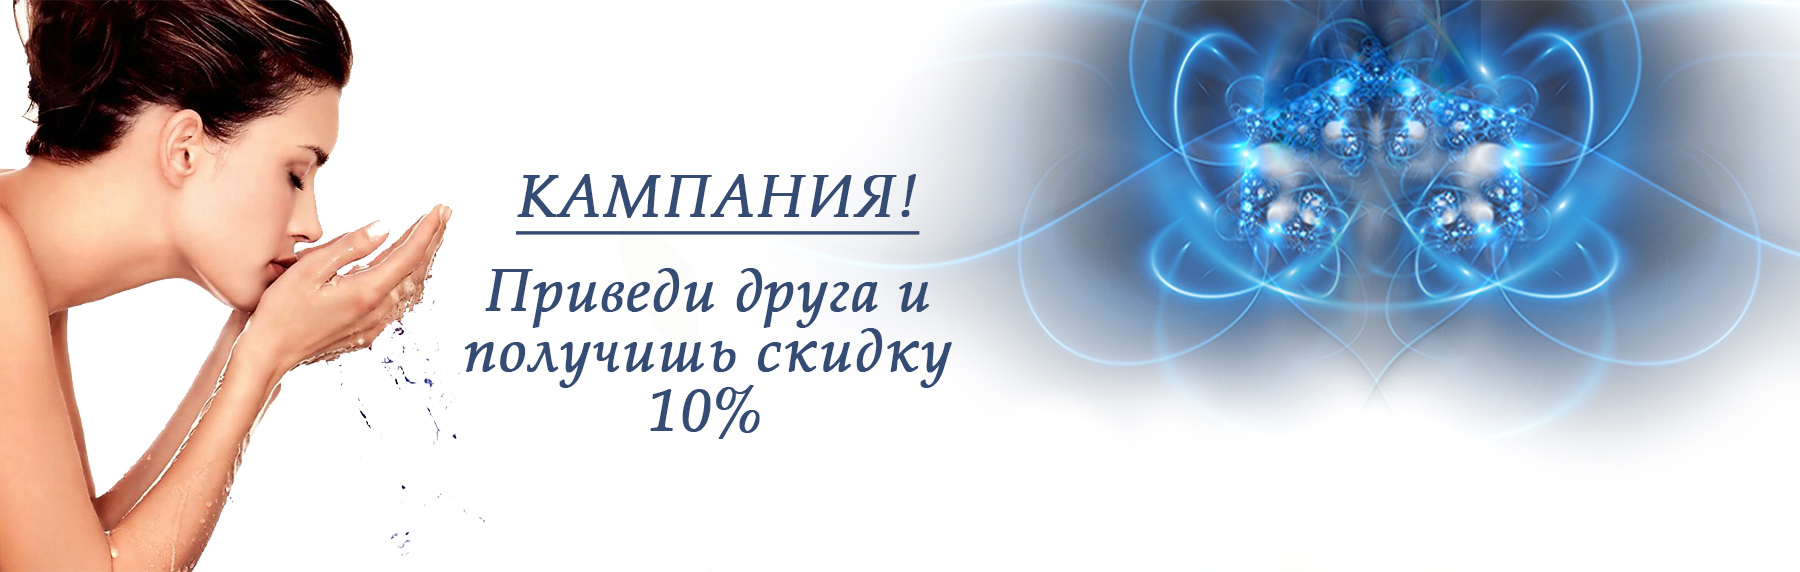 kampaania-slaider-2-sober-rus